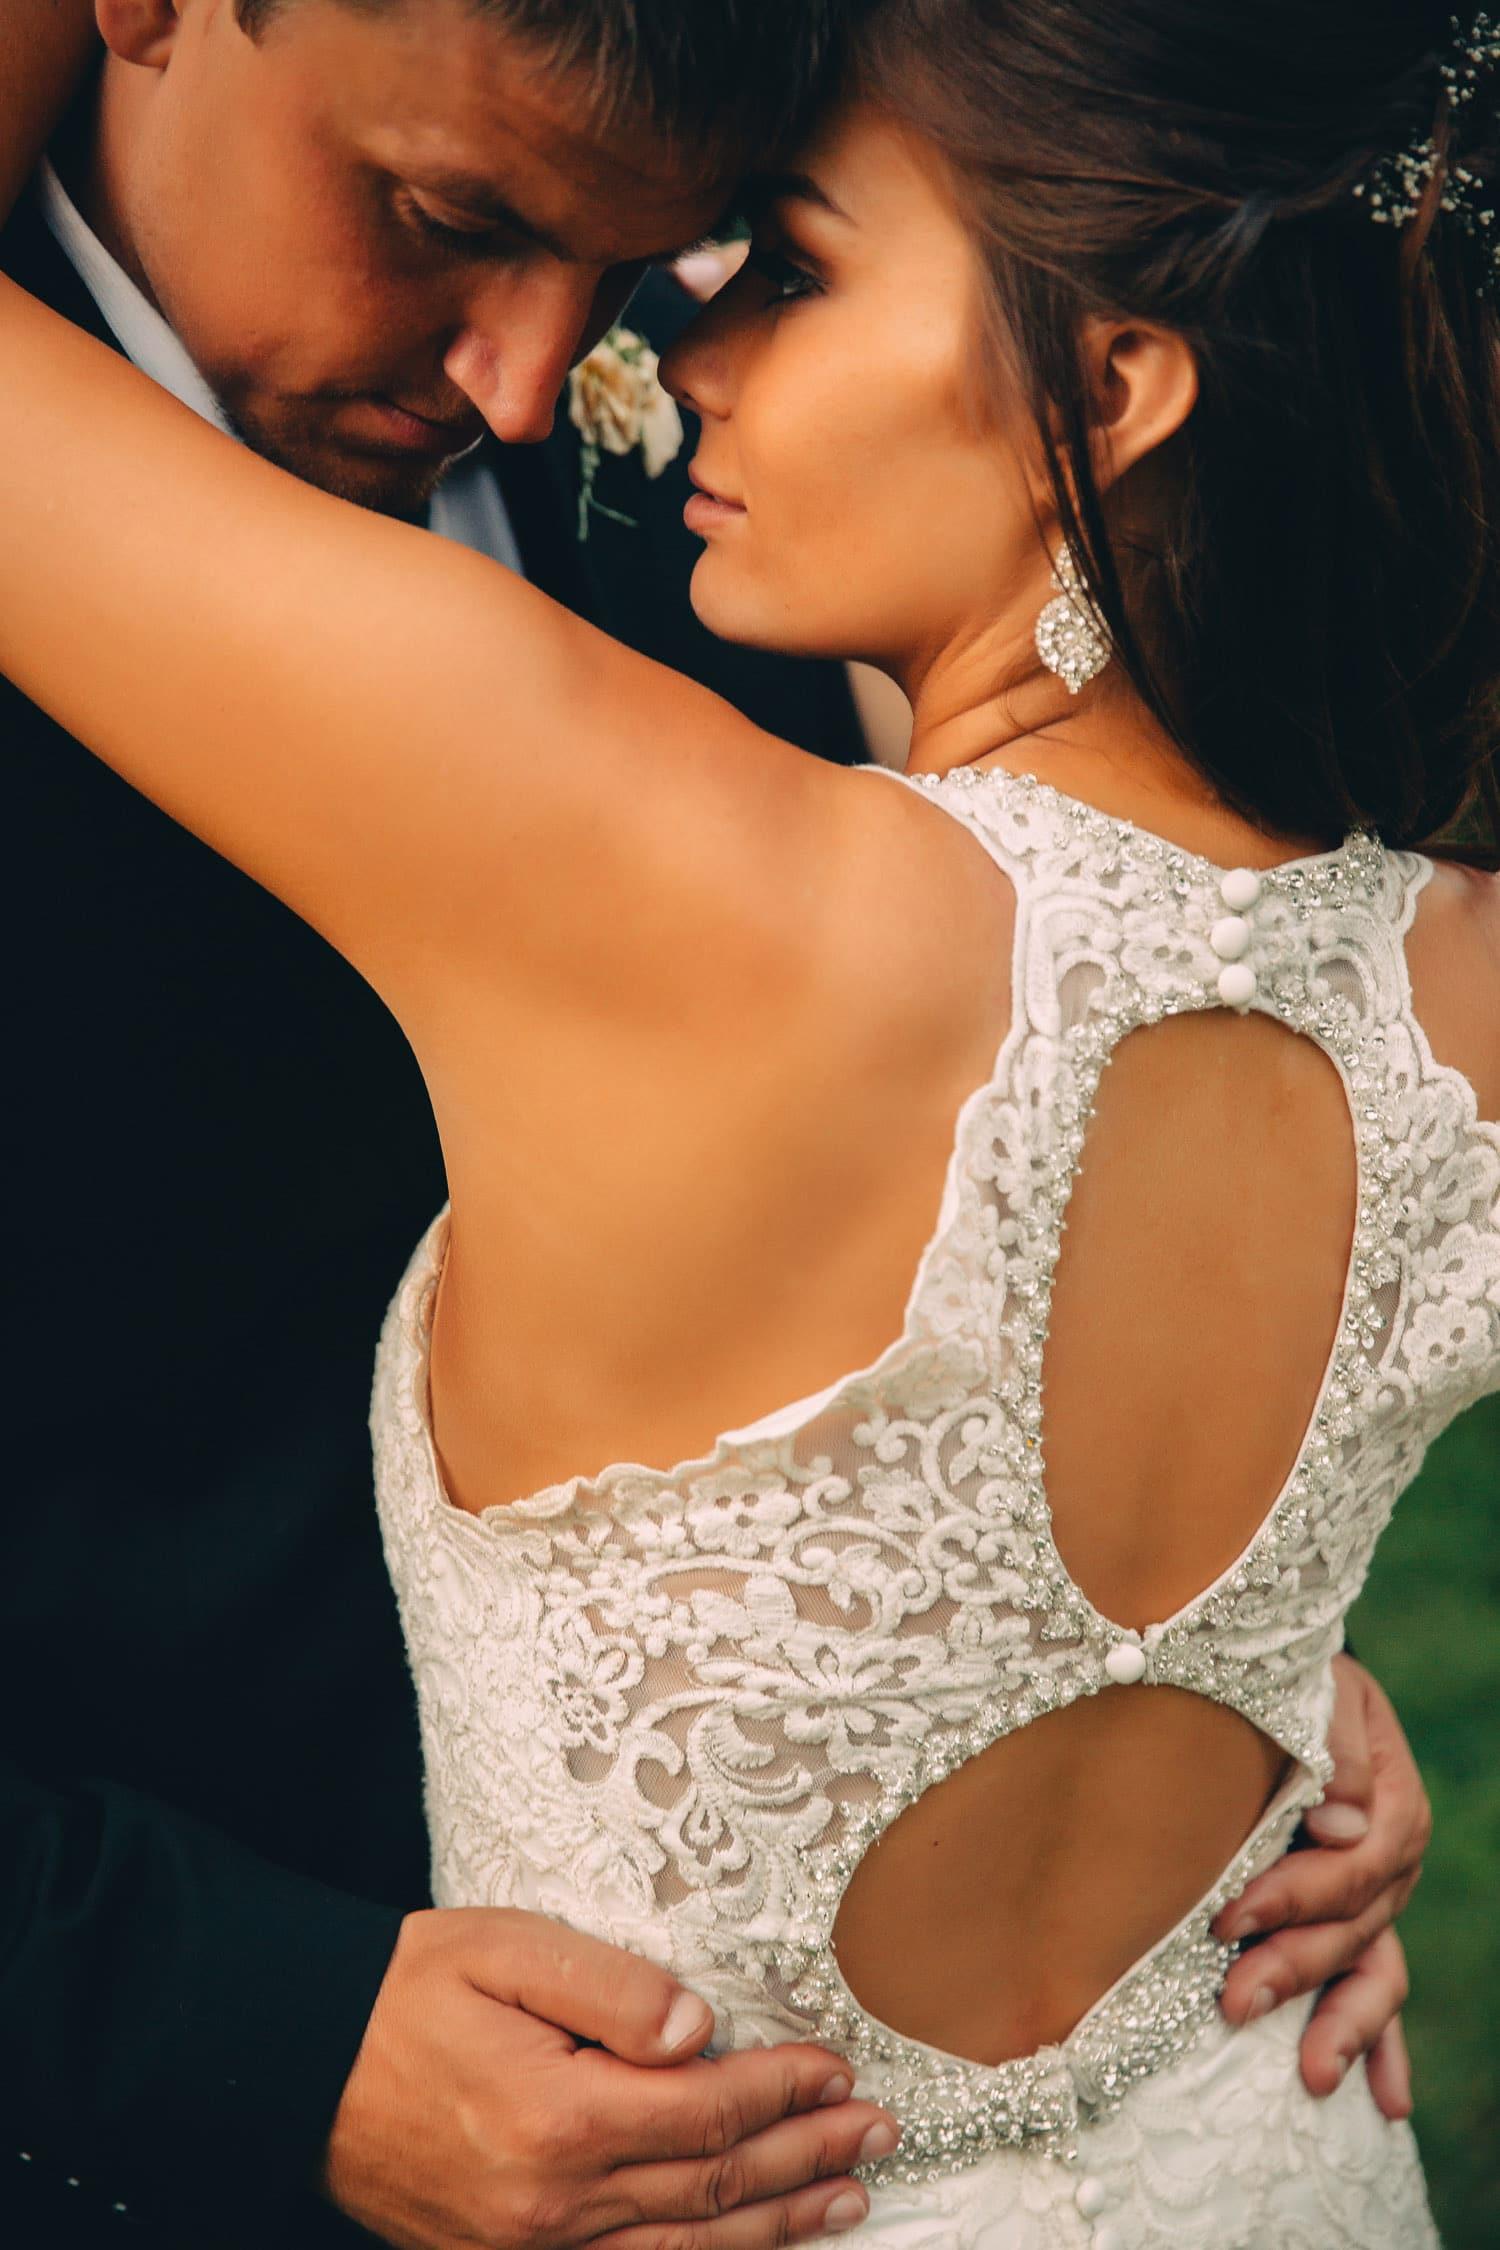 The wedding tree dress